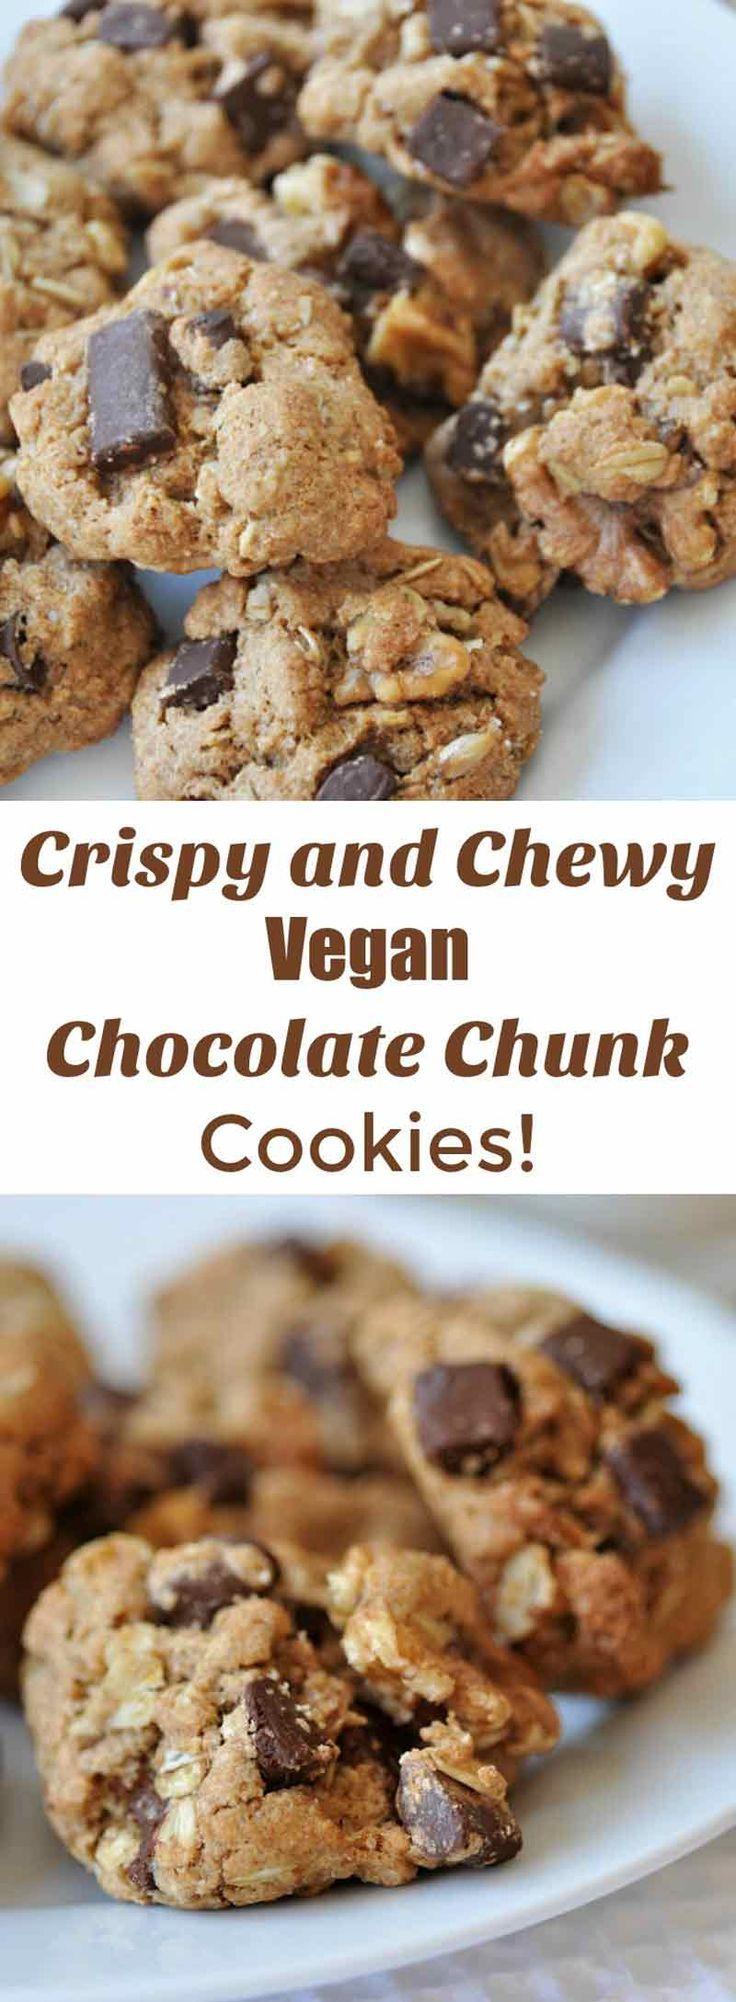 Vegan Chocolate Chunk Oatmeal Cookies | Recipe | Coconut oil chocolate ...